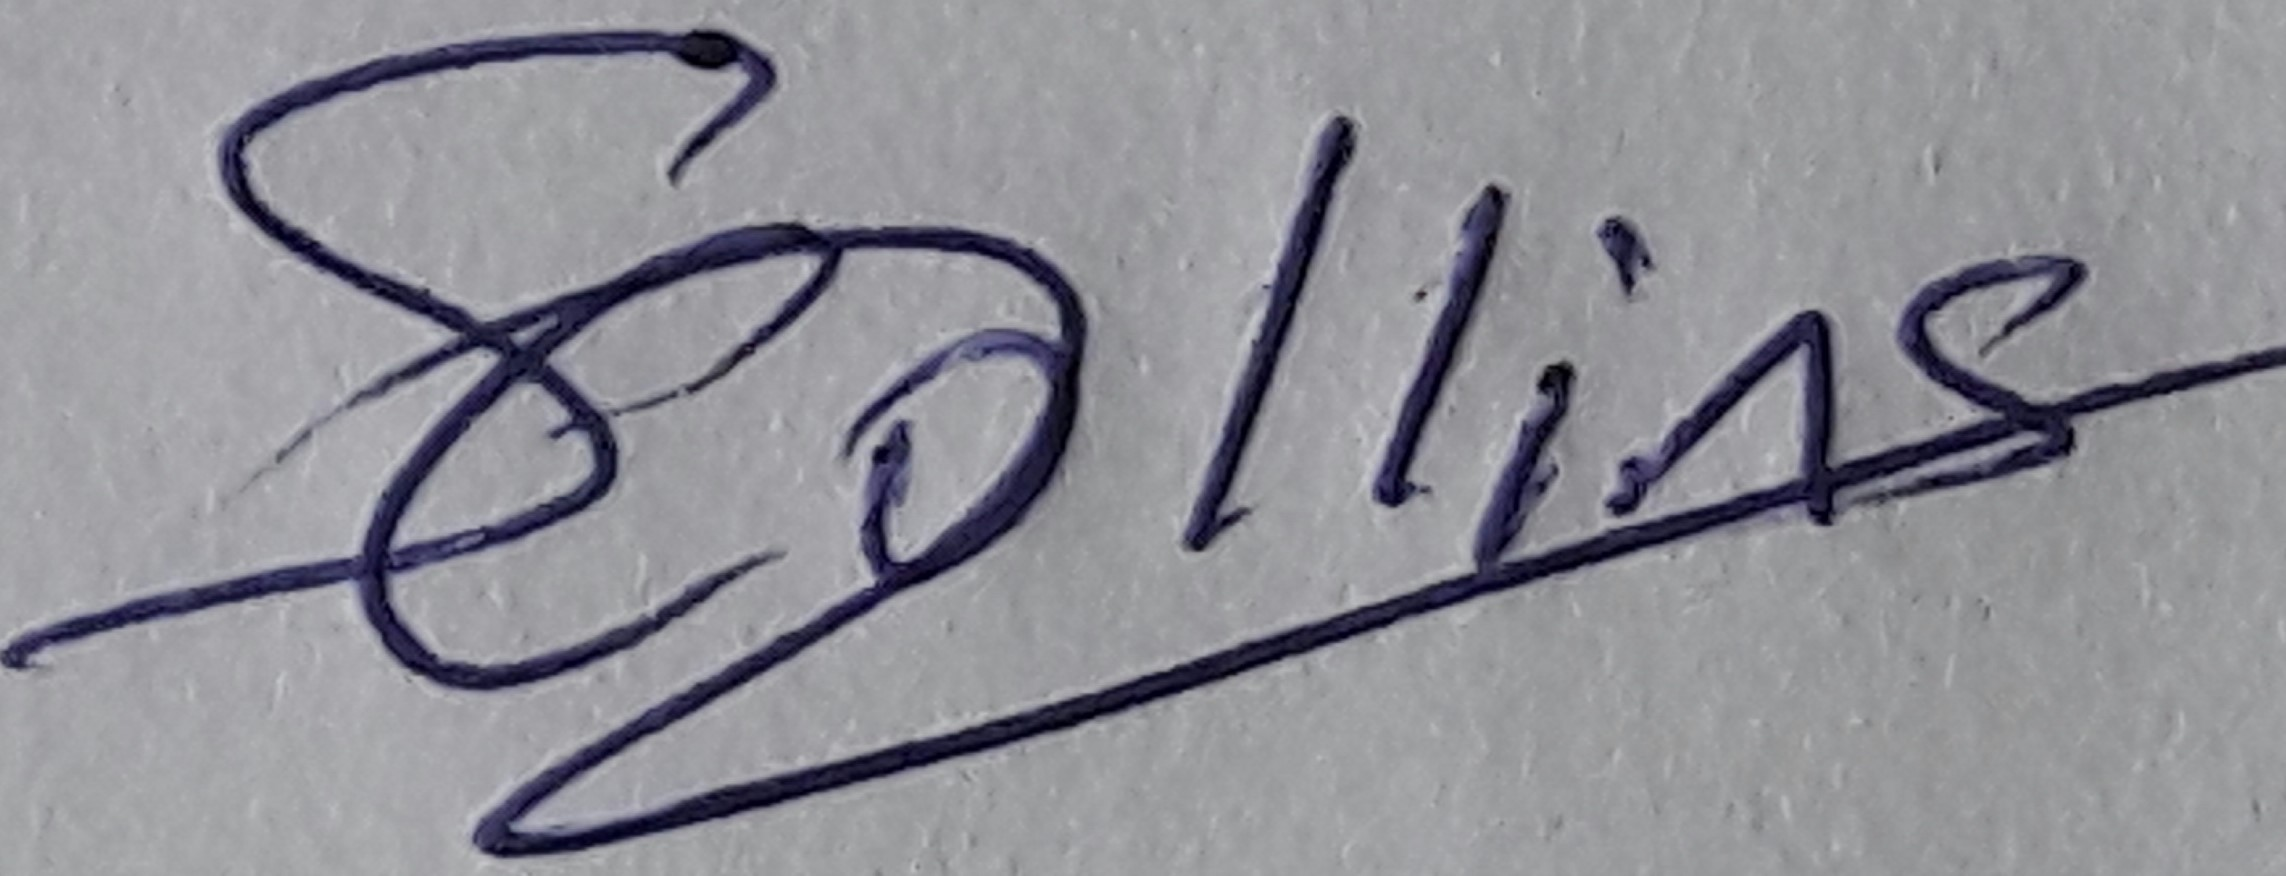 Solomon Collins's Signature